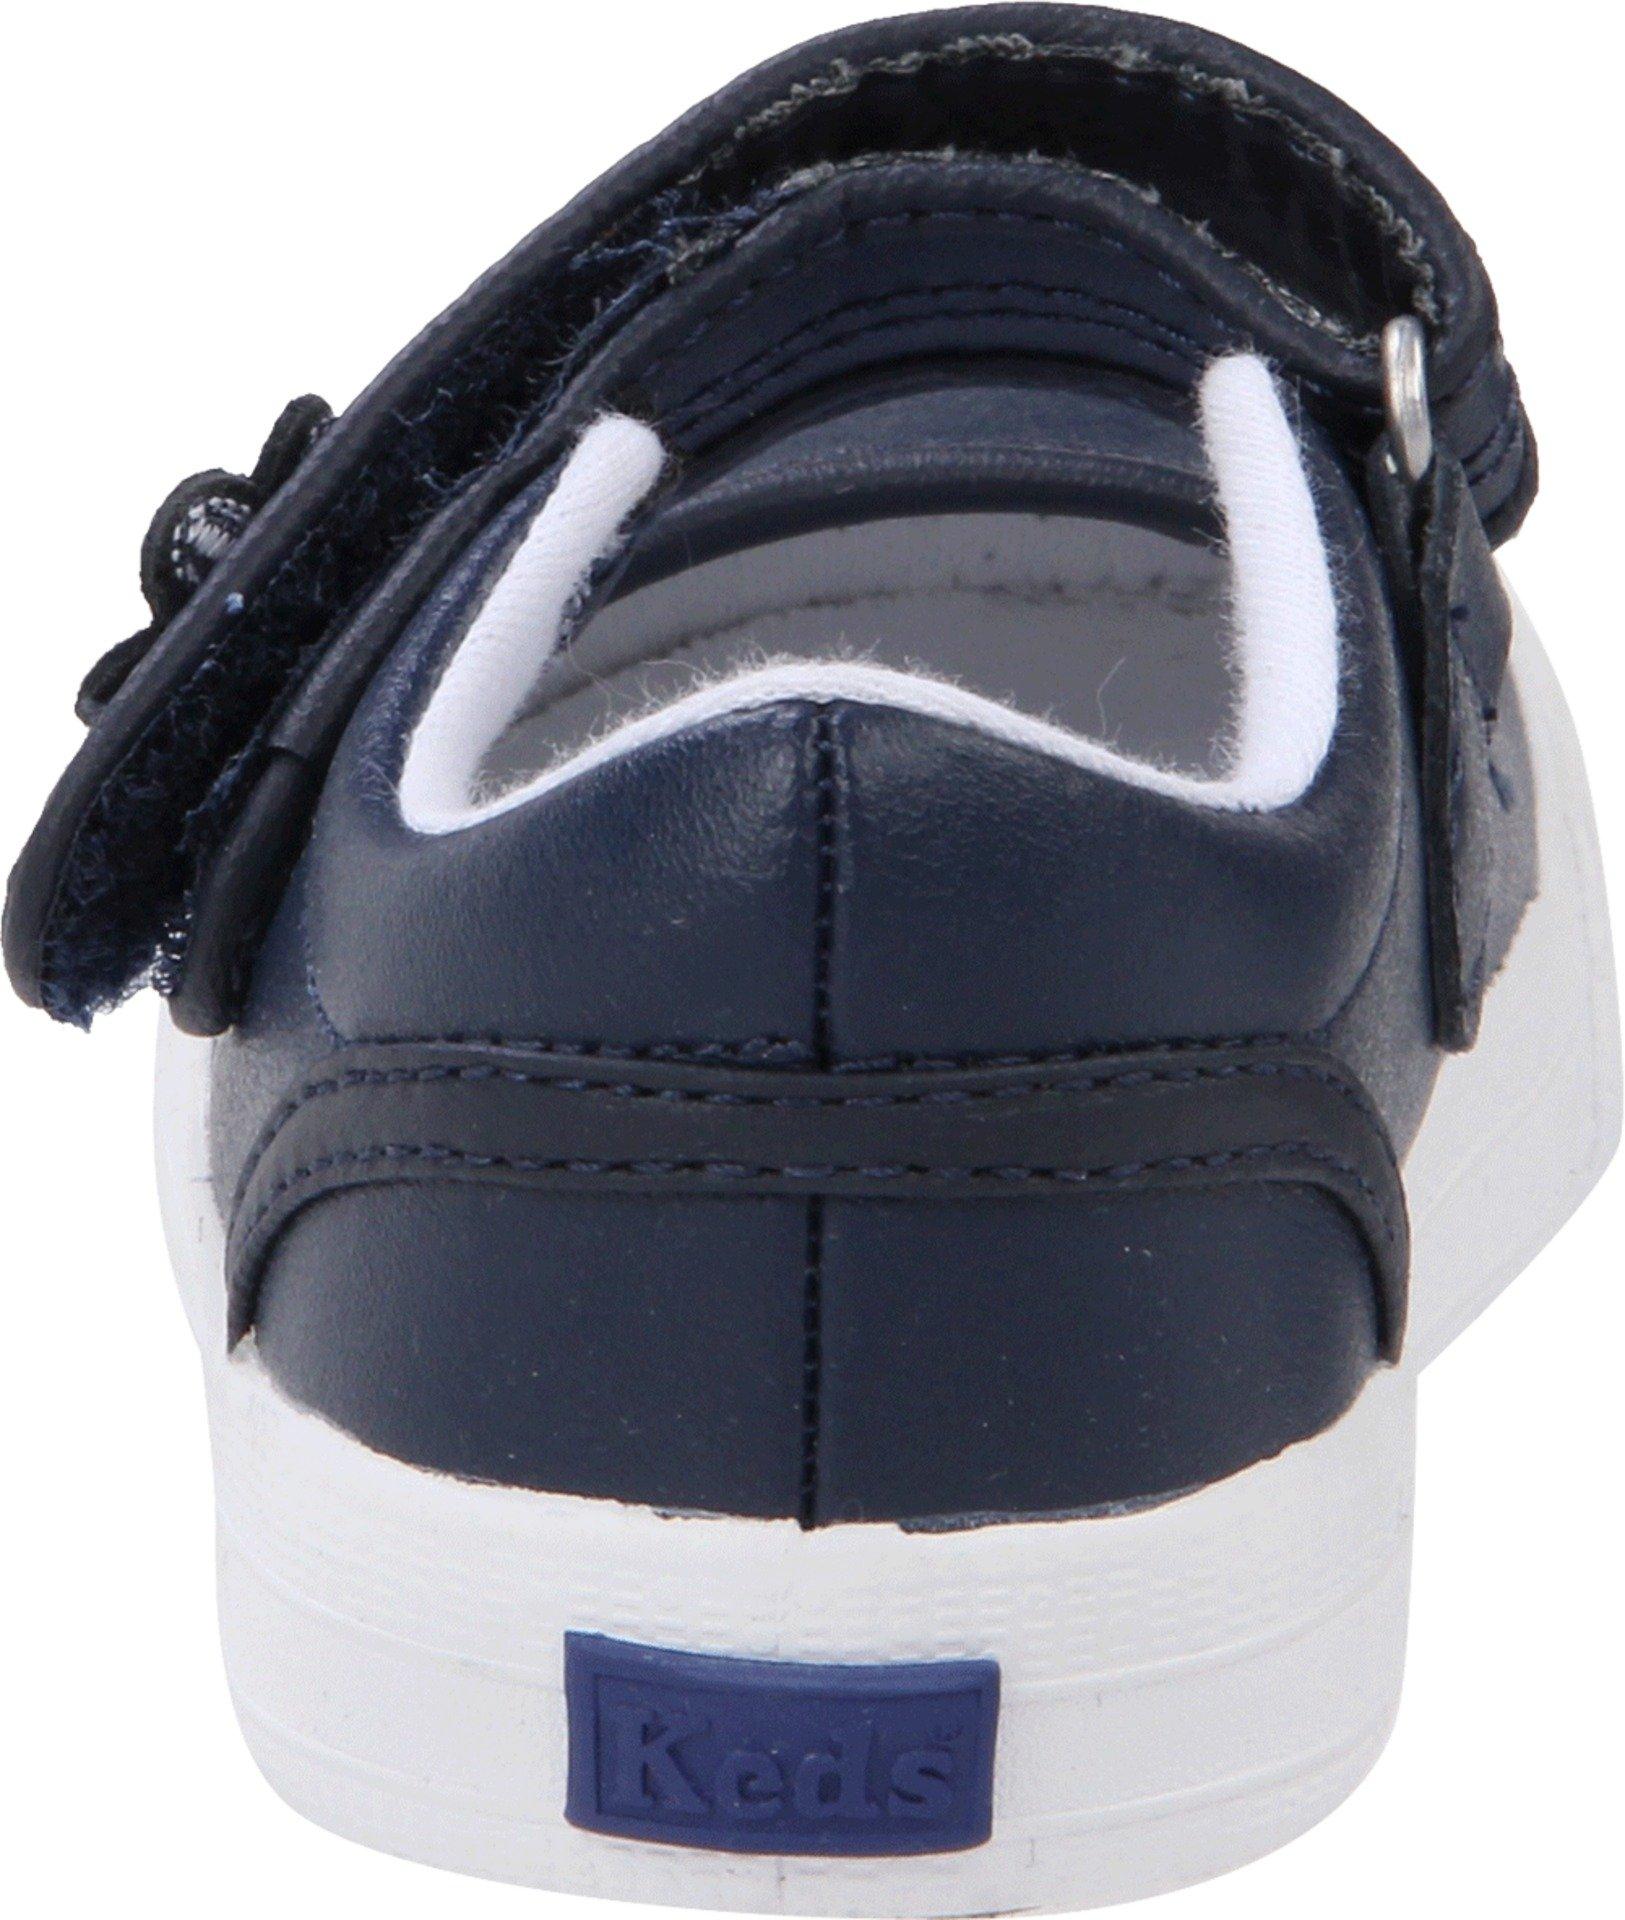 Keds unisex-child Ella Mary Jane Sneaker ,Navy,11 M US Little Kid by Keds (Image #2)